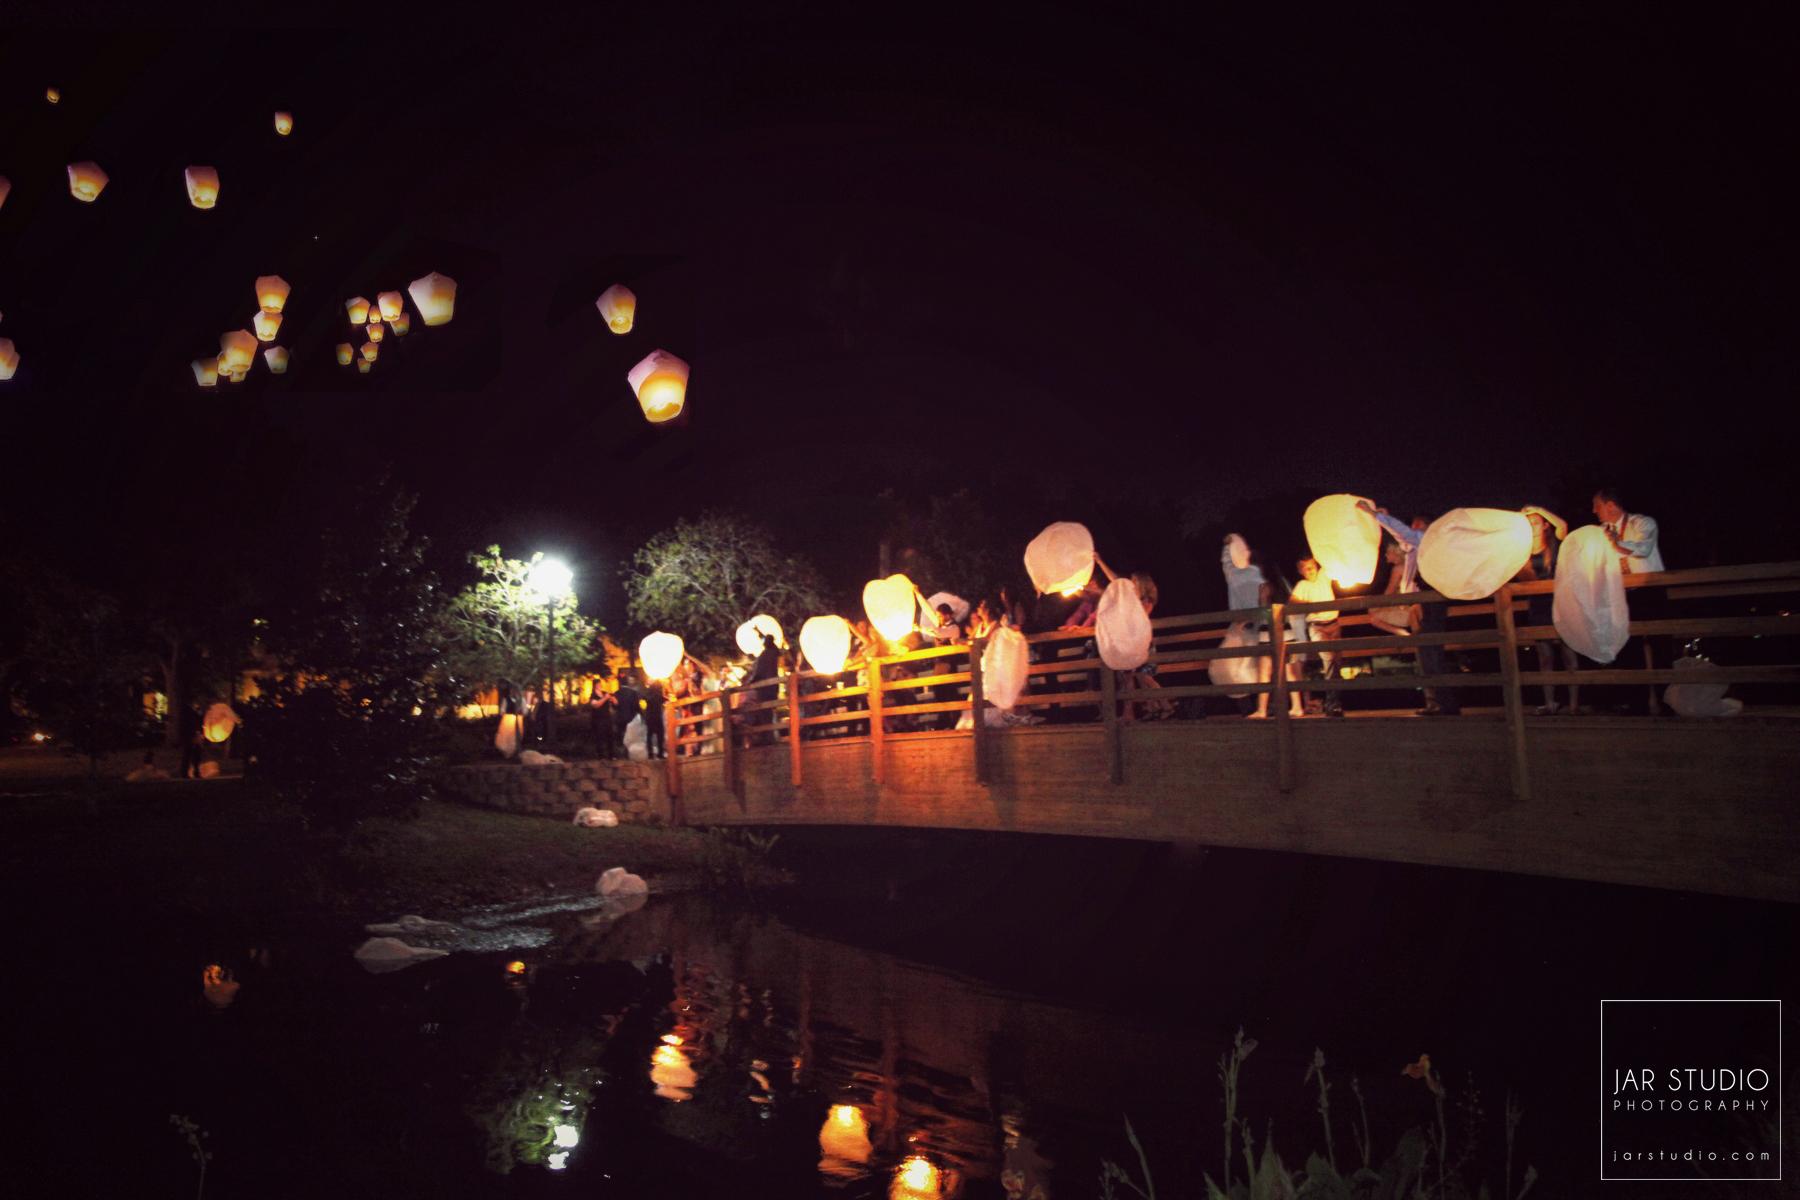 36-beautiful-lanterns-wedding-sendout-jarstudio-photography.JPG